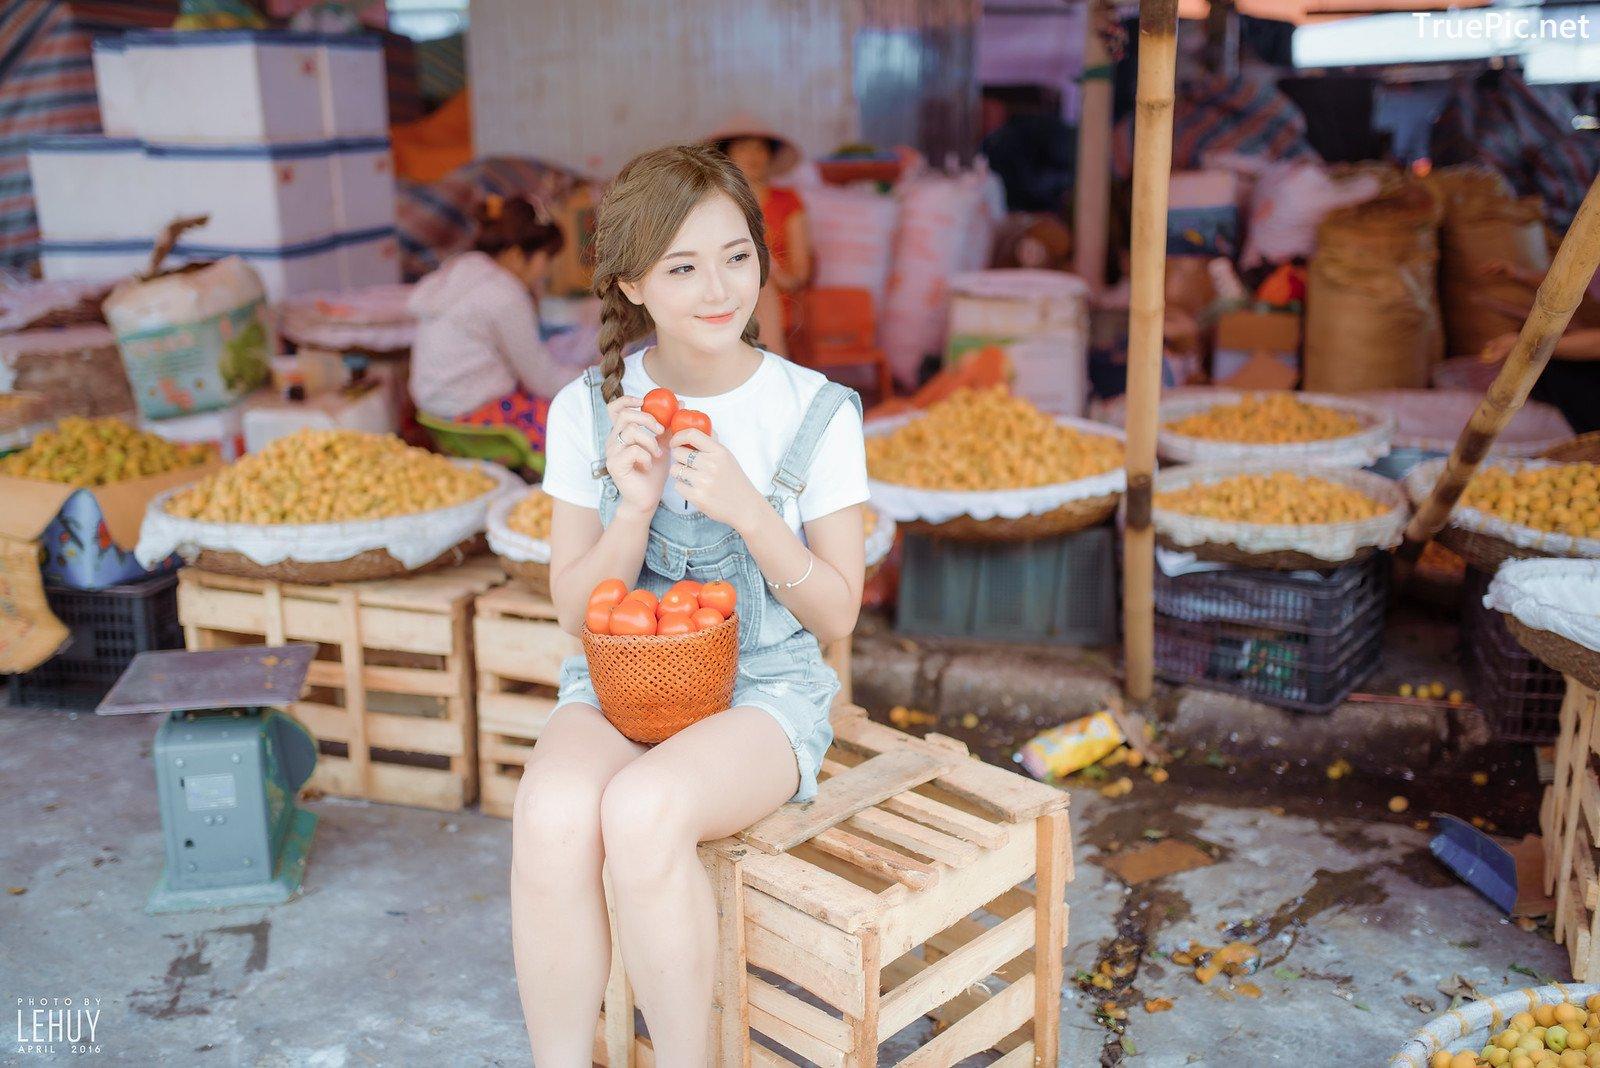 Image-Vietnamese-Hot-Girl-Photo-Album-Tomato-Little-Girl-Cute-TruePic.net- Picture-10